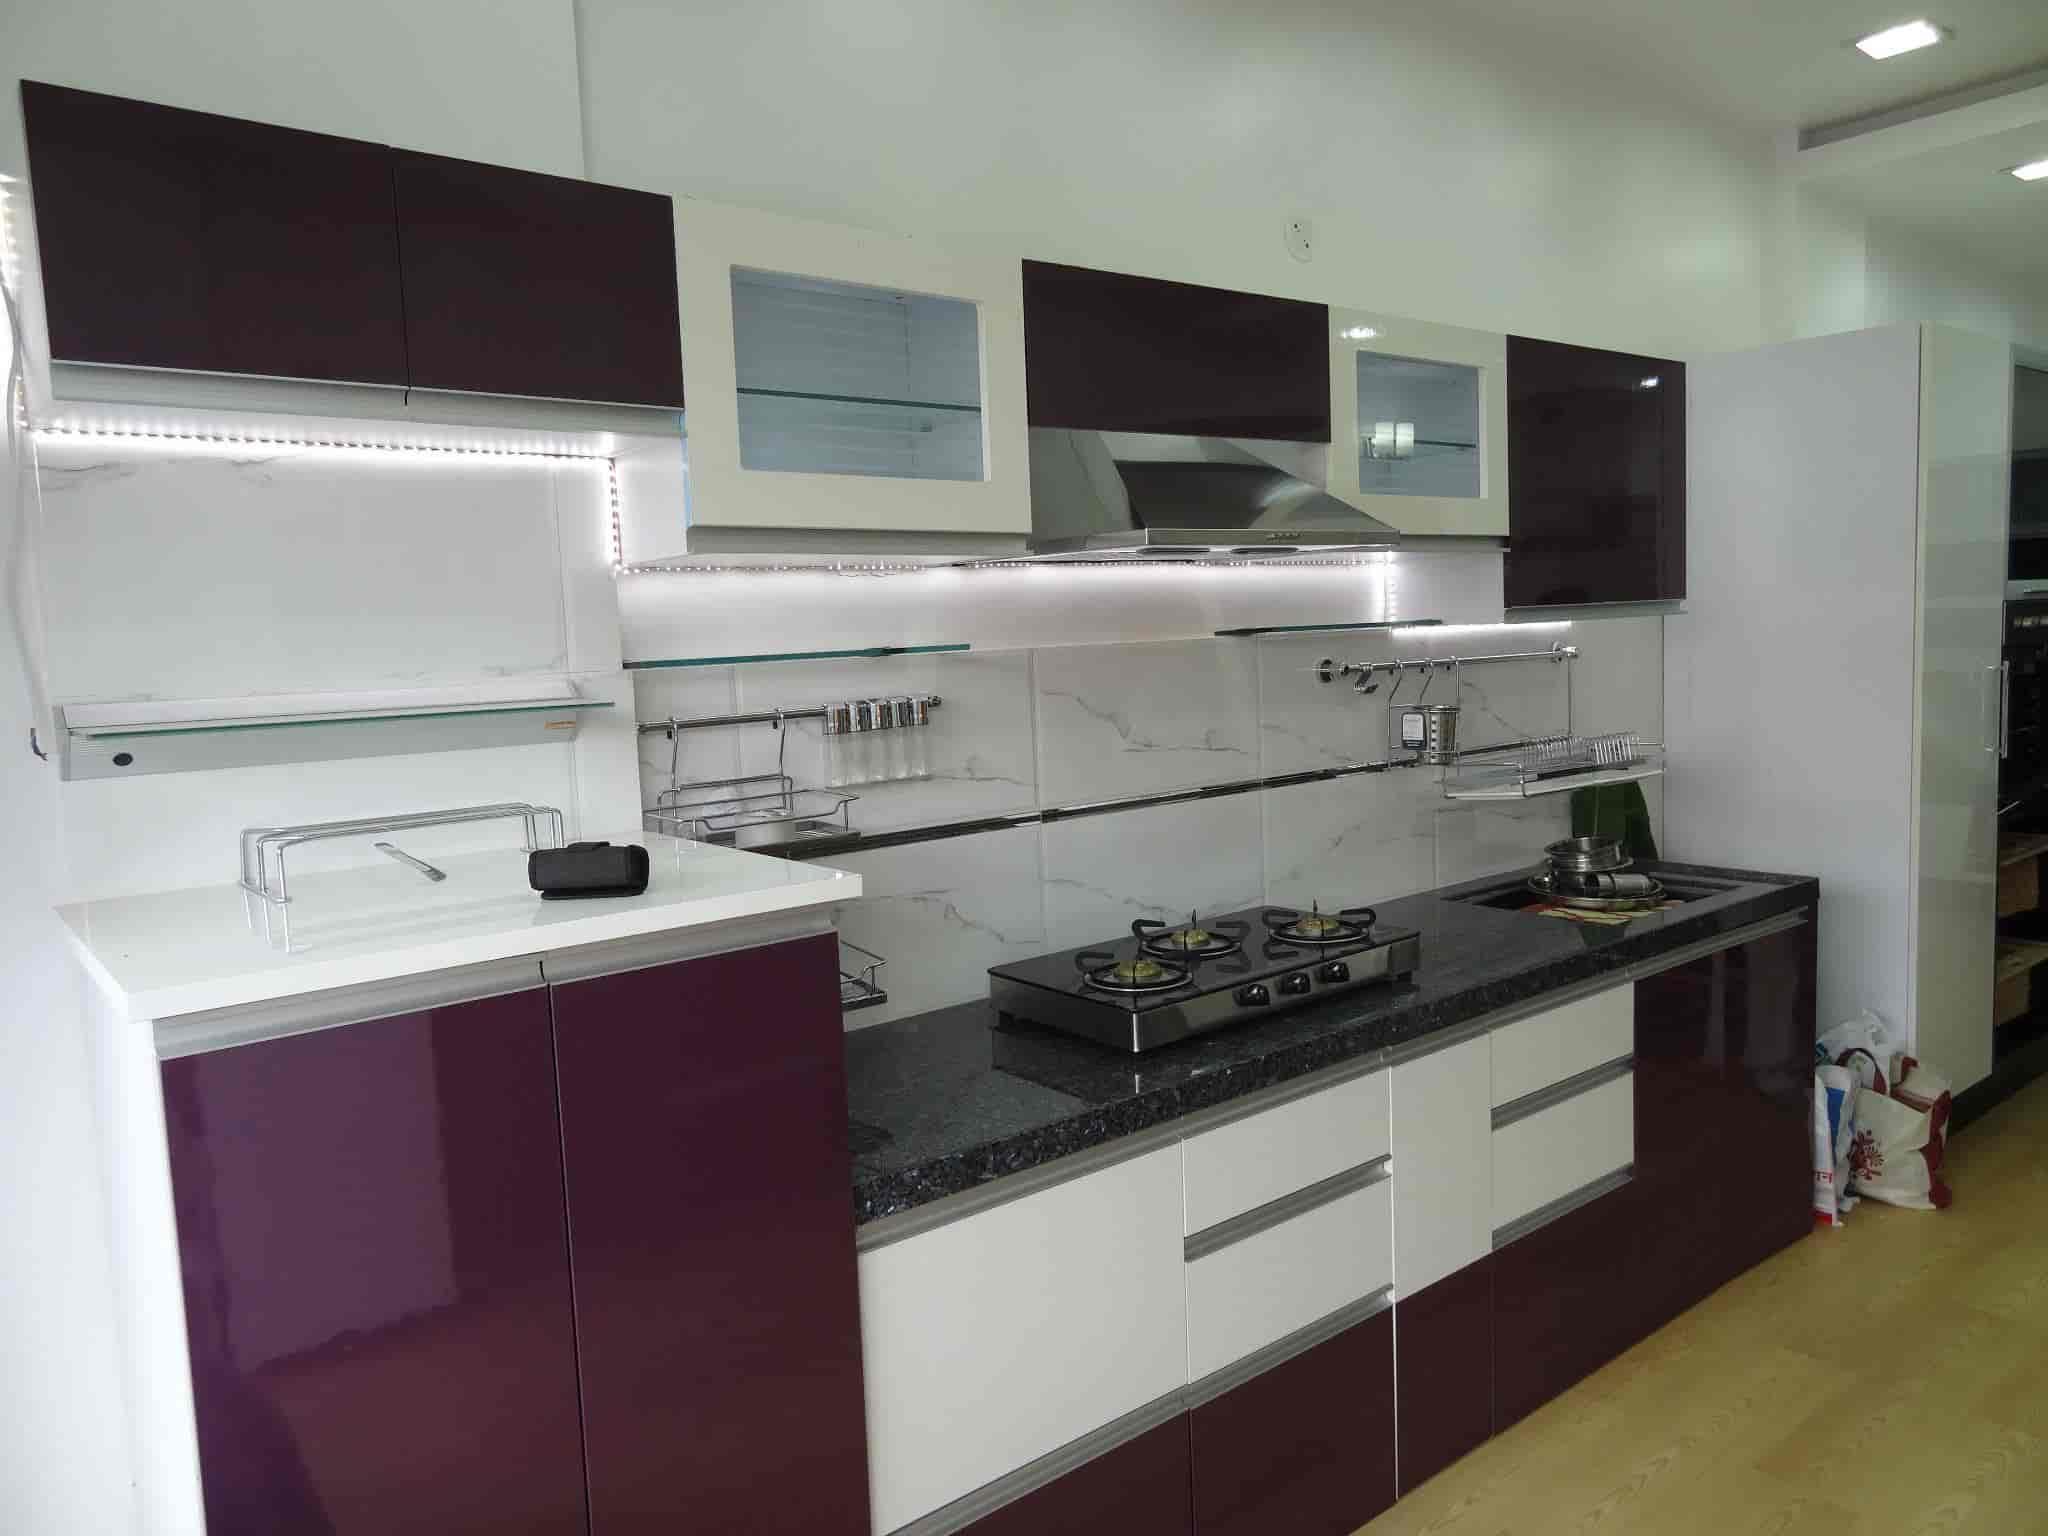 kitchen design in pune.  Modular Kitchen Design View D Decor And Interior Closed Down Photos Wakad Pune